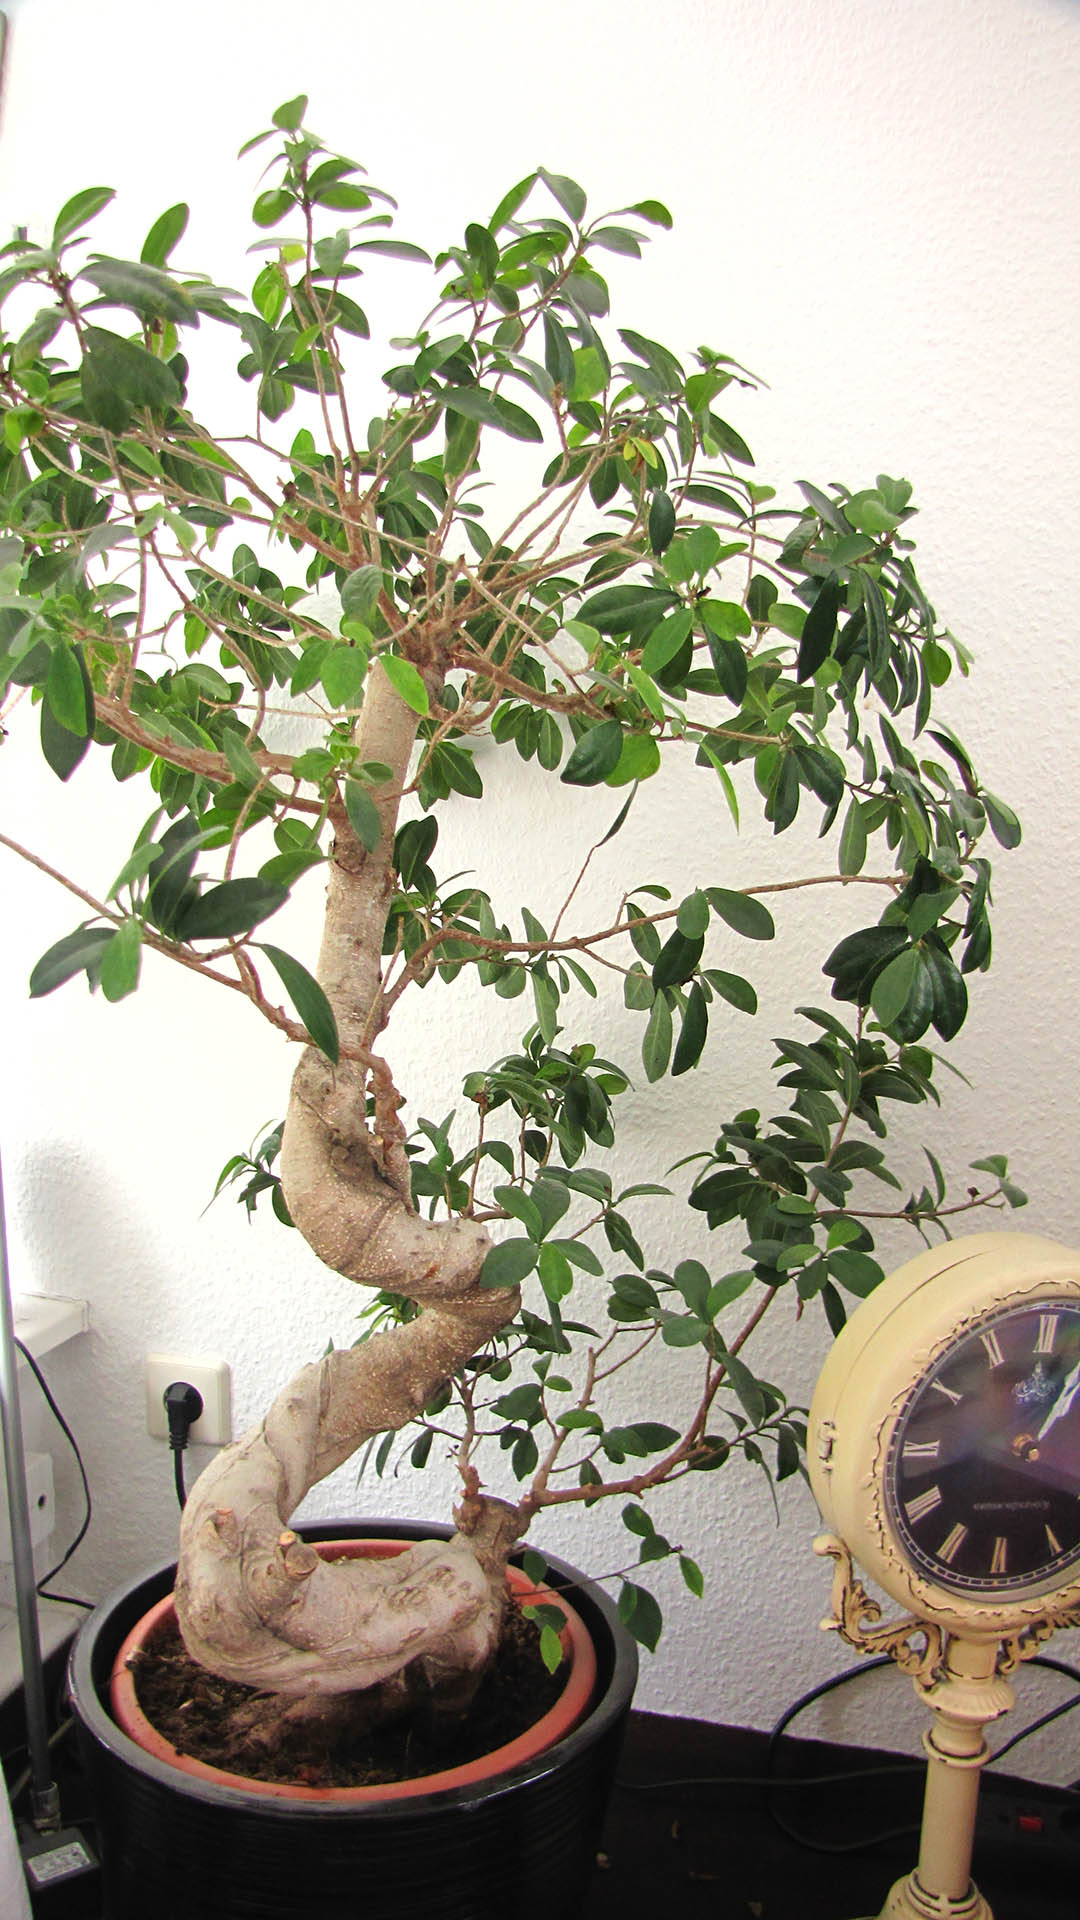 ficus australis ikea 3 fragen gie en schneiden d ngen. Black Bedroom Furniture Sets. Home Design Ideas